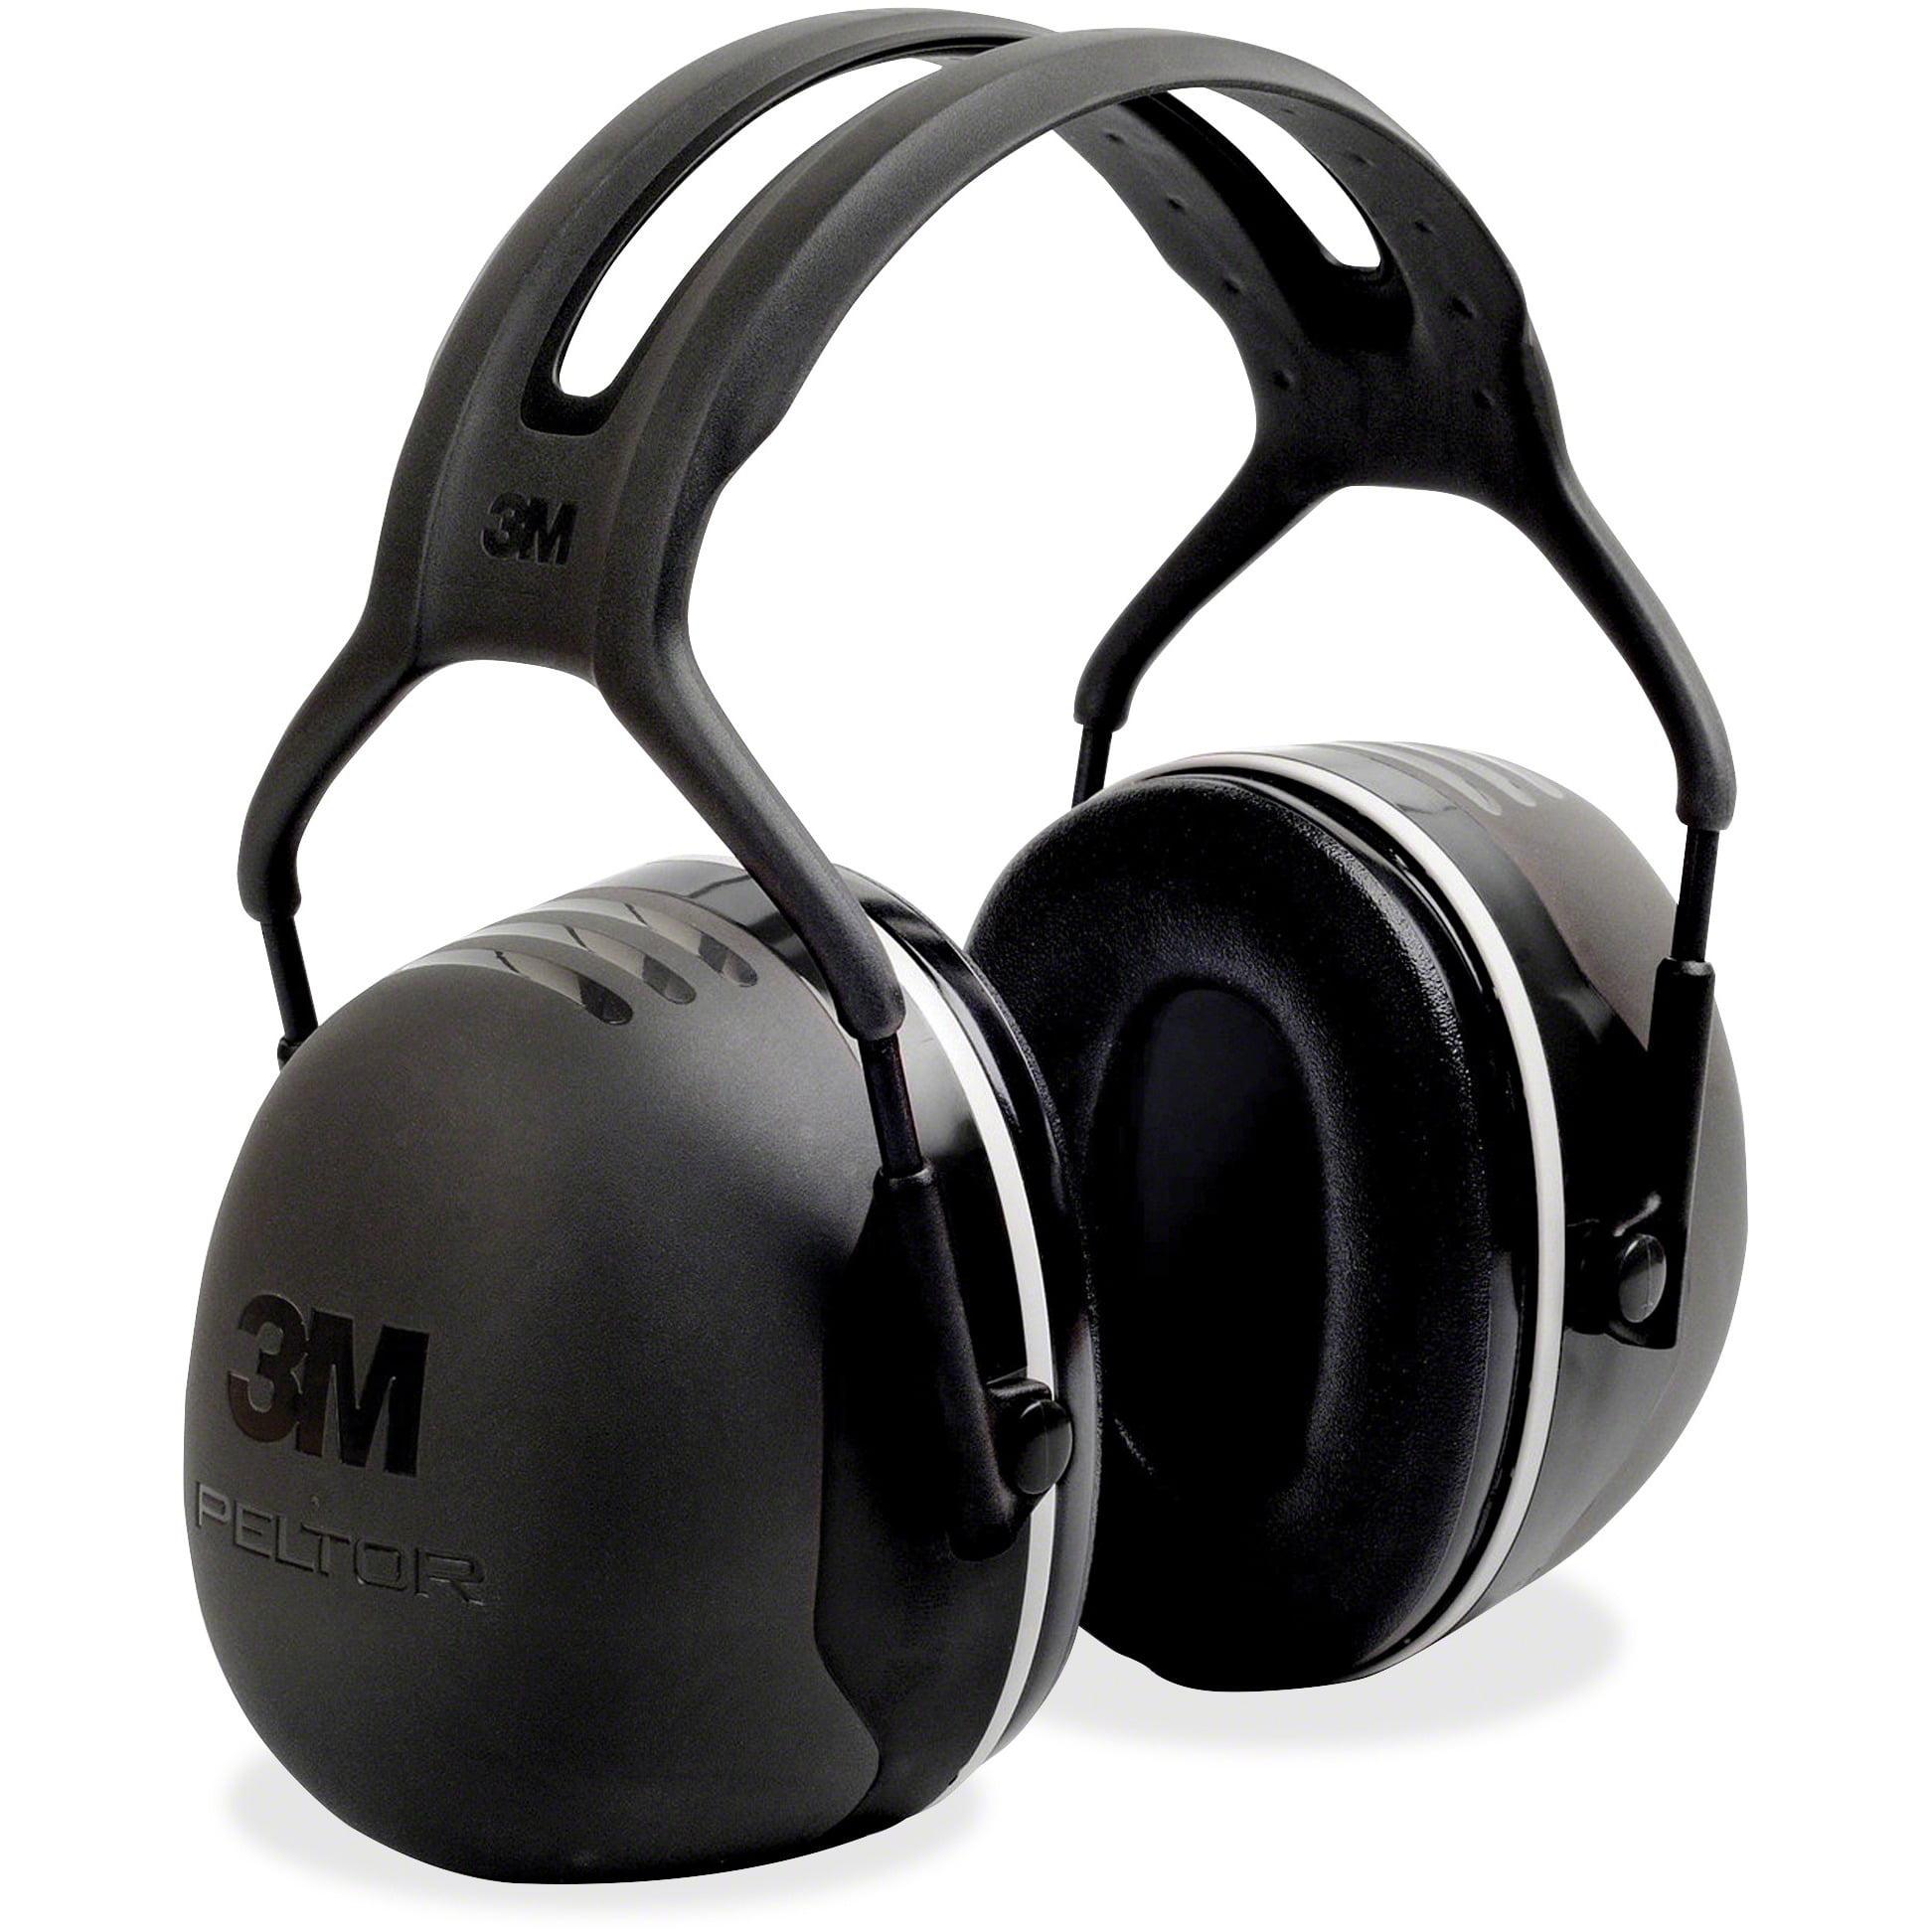 Peltor, MMMX5A, X-Series Over-The-Head X5 Earmuffs, 1 / Each, Black